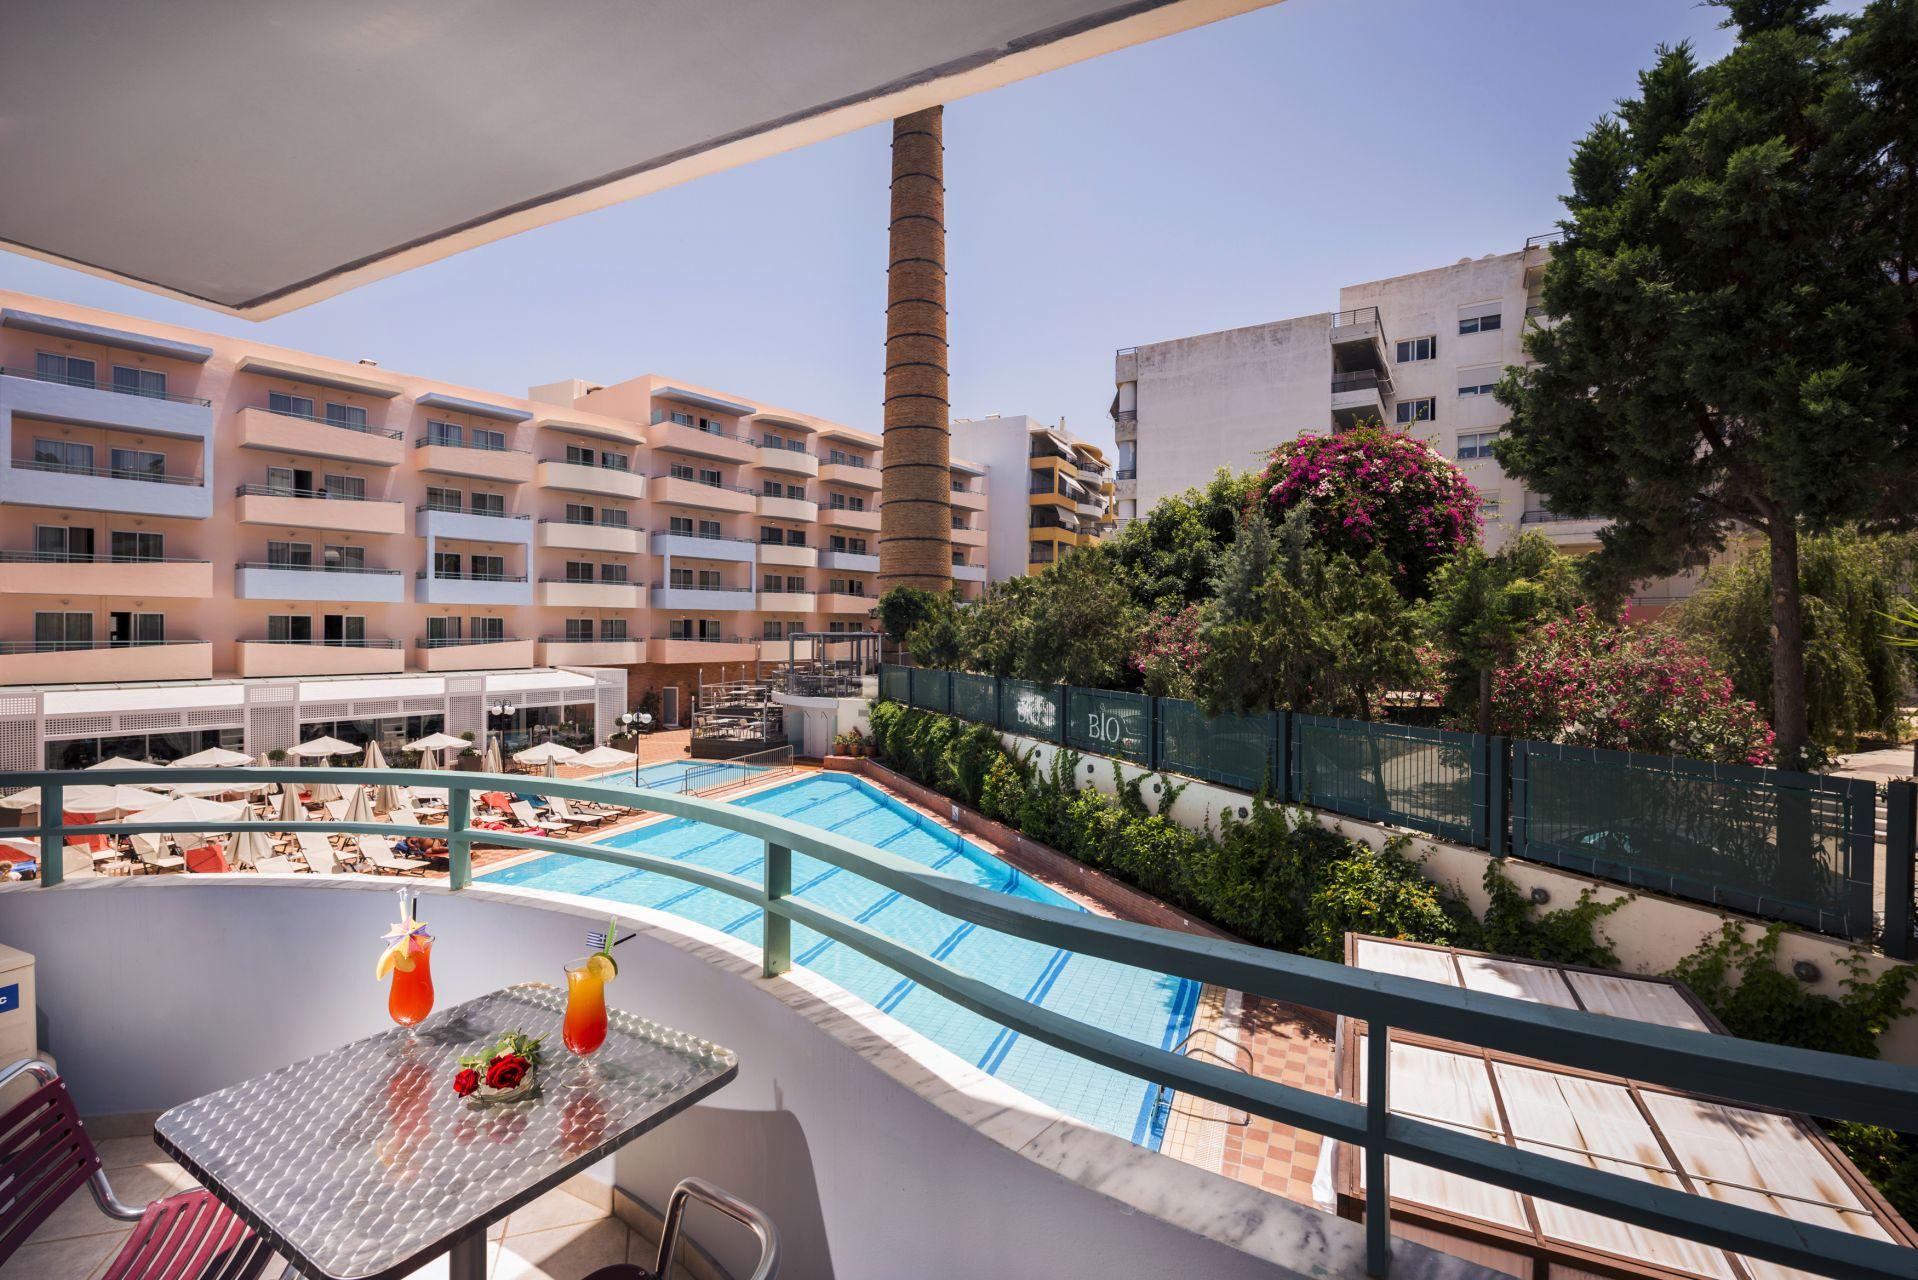 Leilighet med To Soverom - BIO Suites Hotel in Rethymnon ...